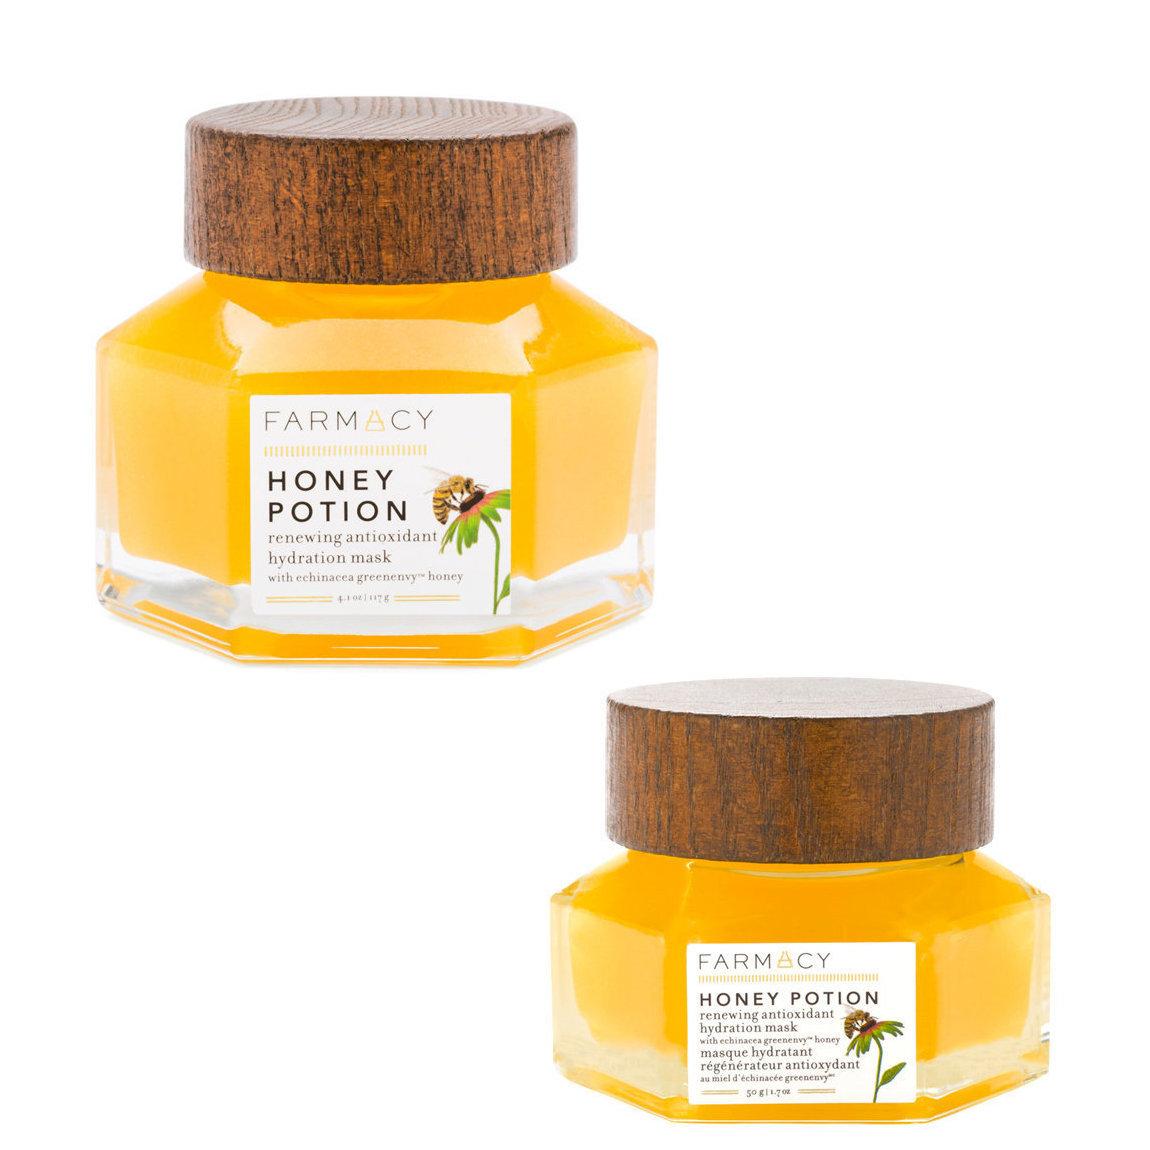 Buy one full-size Honey Potion, get a free 1.7-oz mini